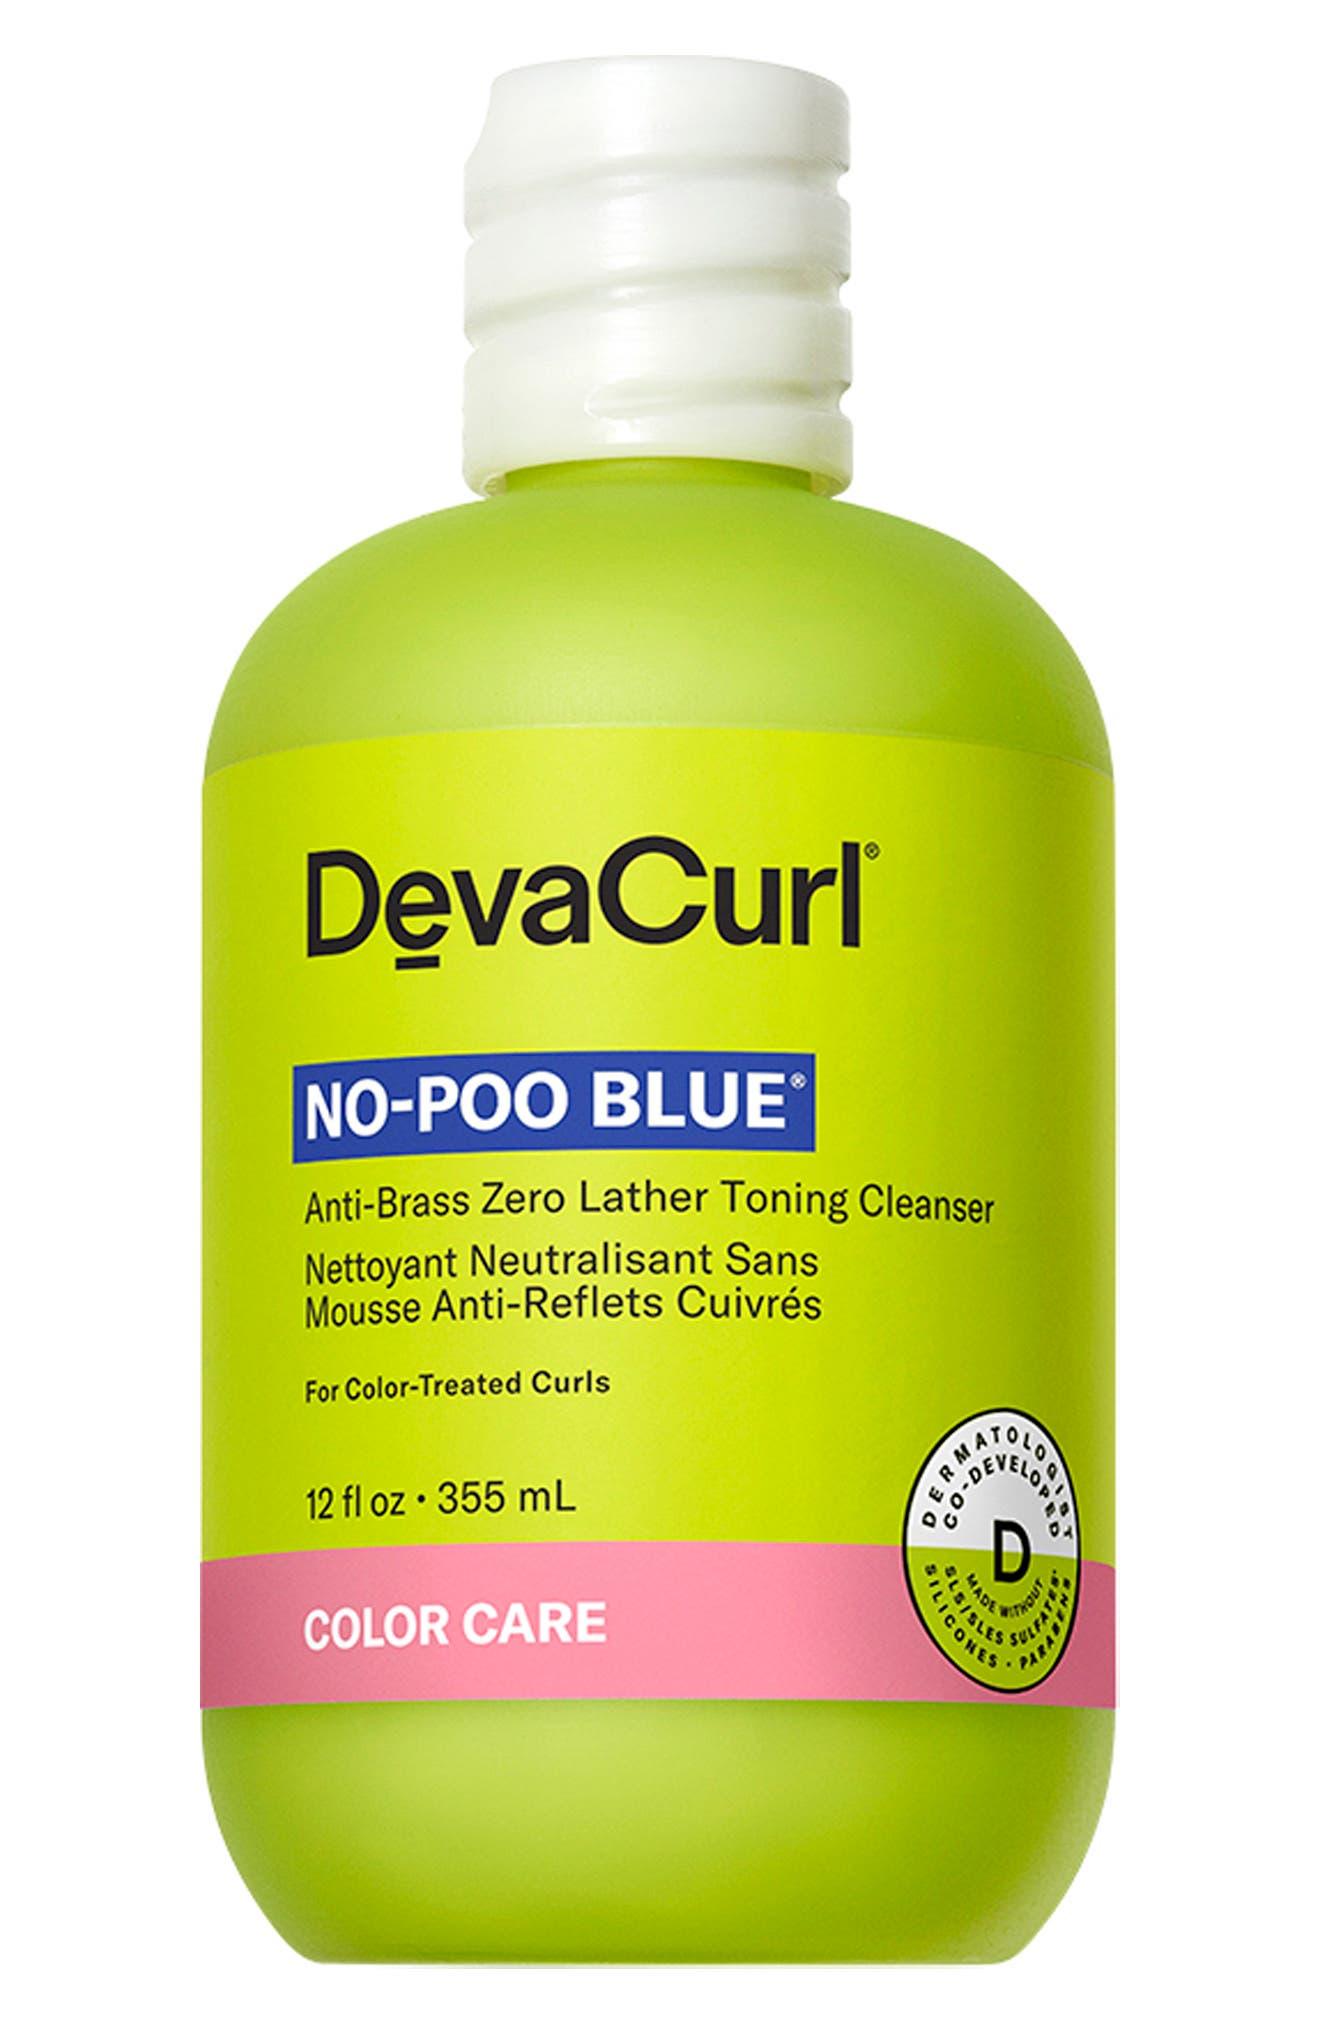 DevaCurl No-Poo Blue(R) Anti-Brass Zero Lather Toning Cleanser